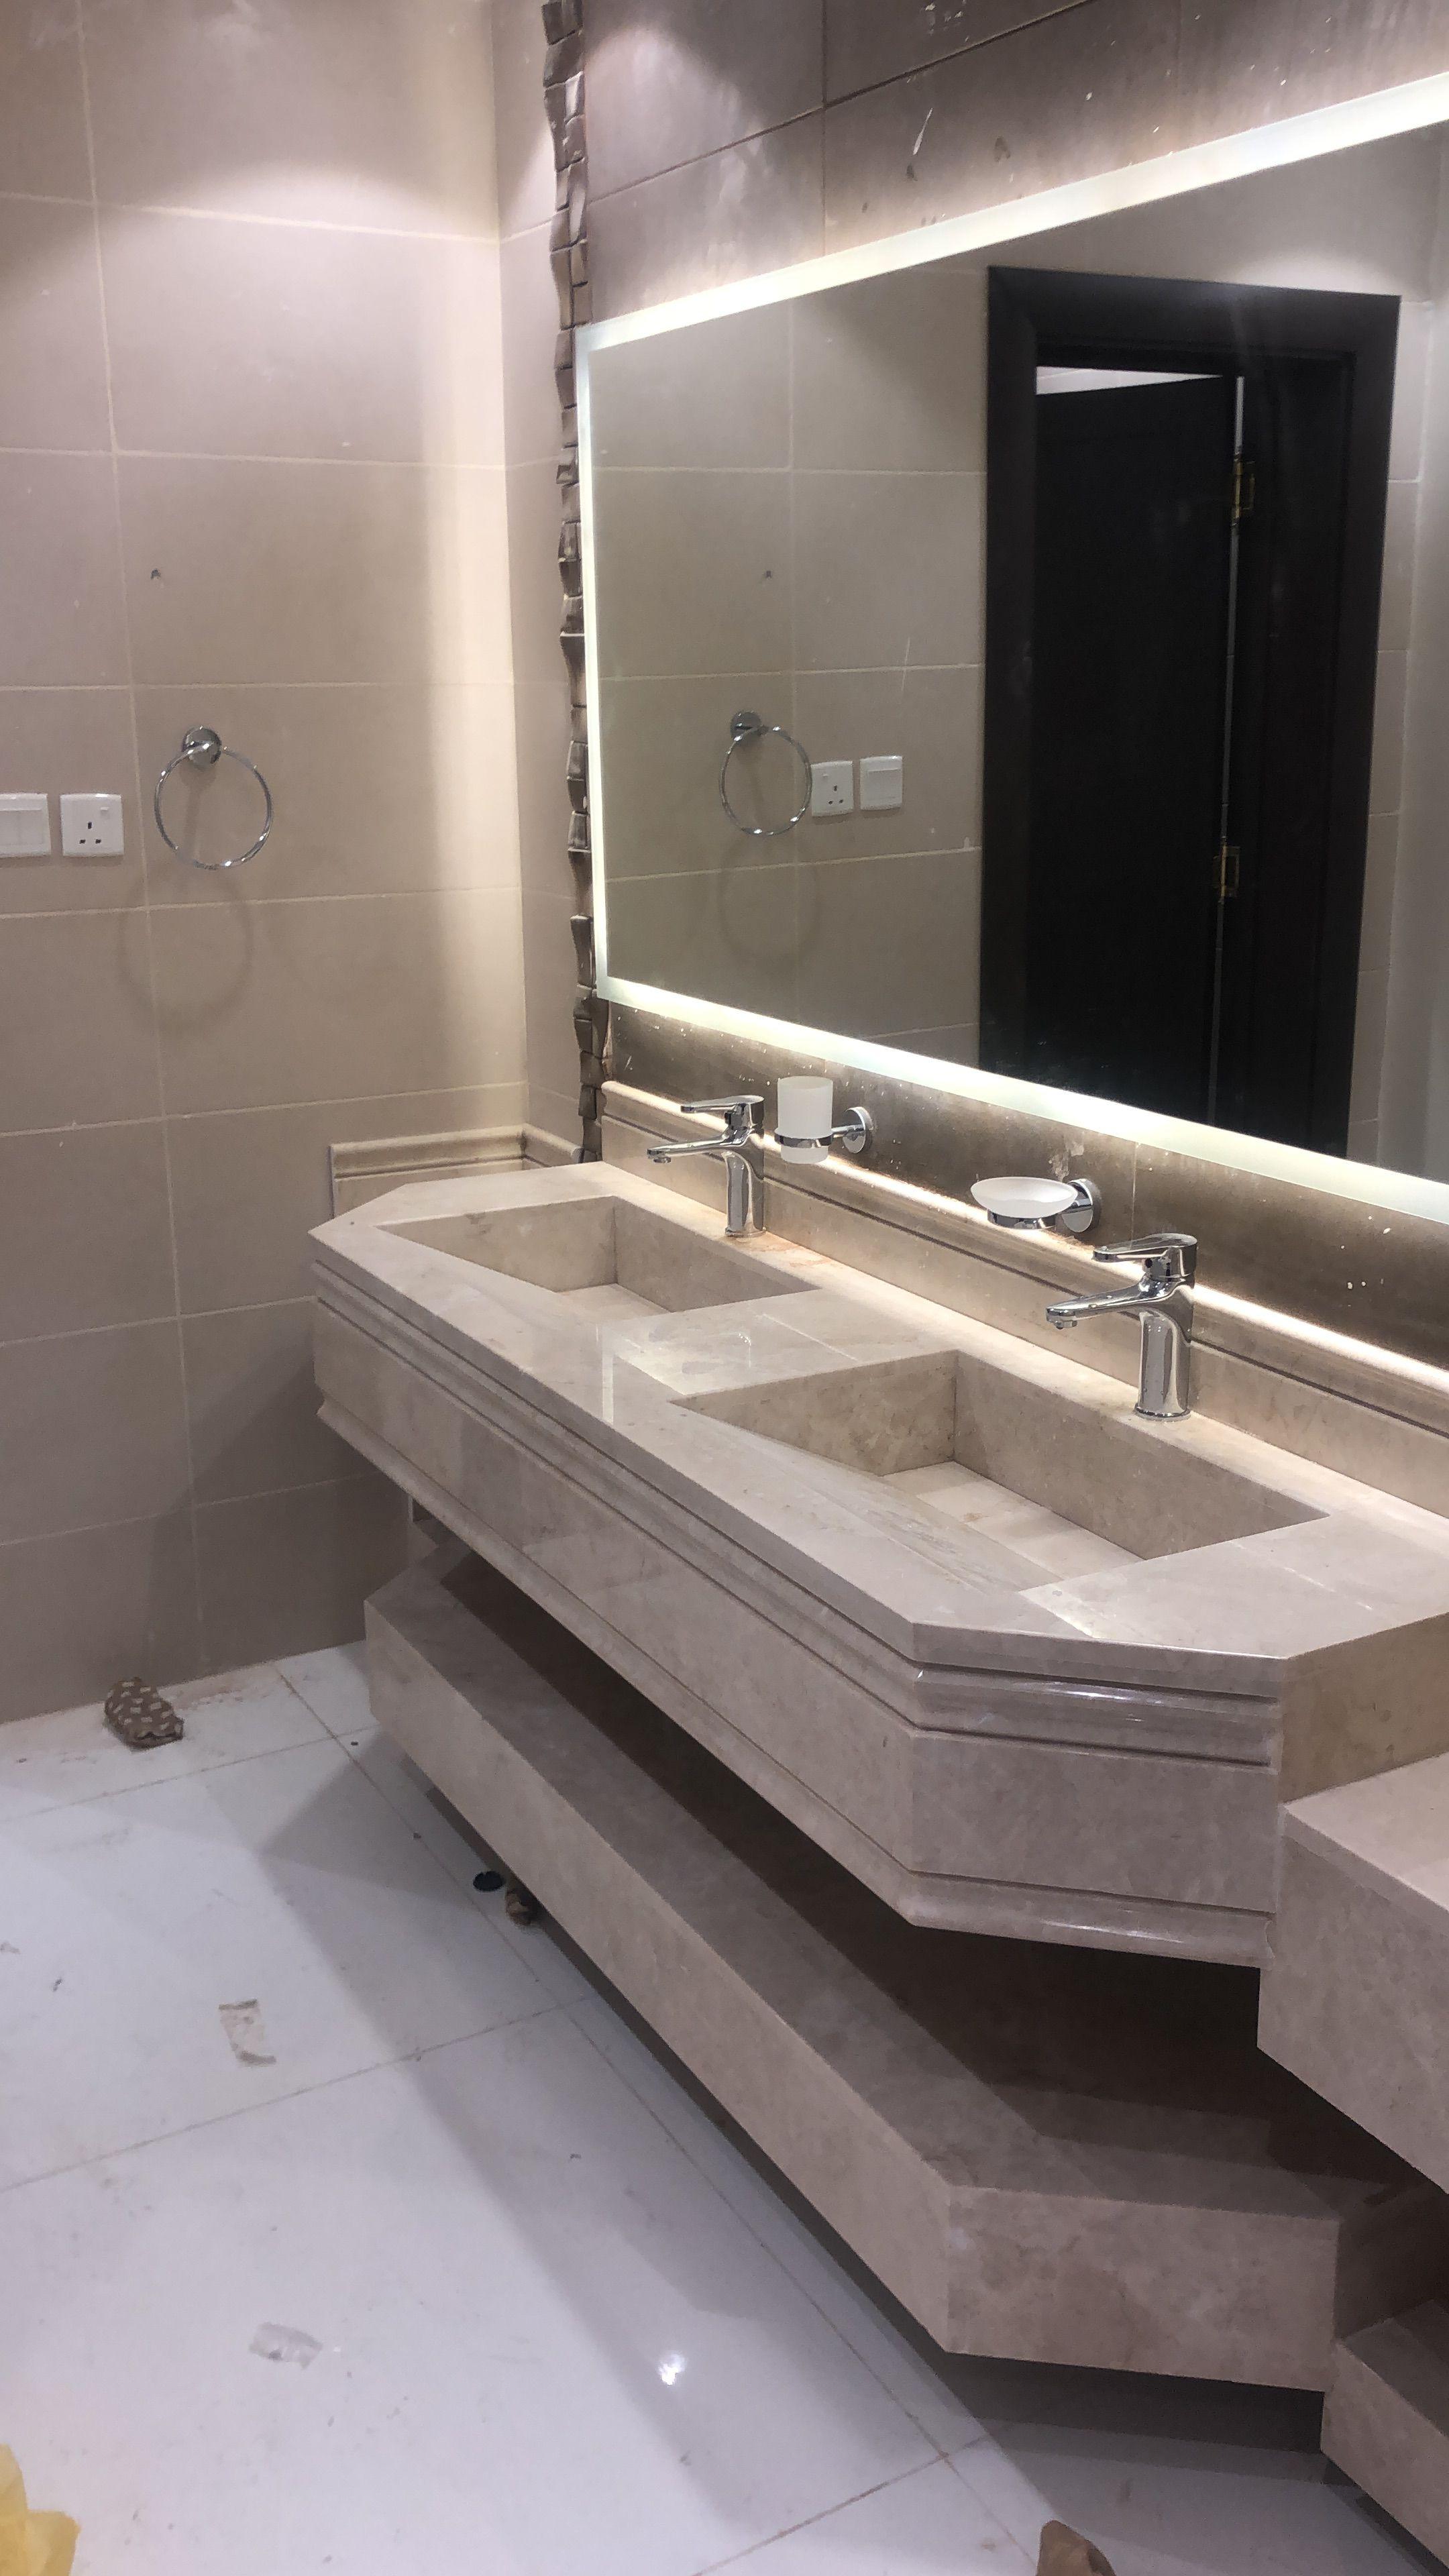 Pin By Asma Almashani On Projects To Try Restroom Design Small Bathroom Decor Bathroom Decor